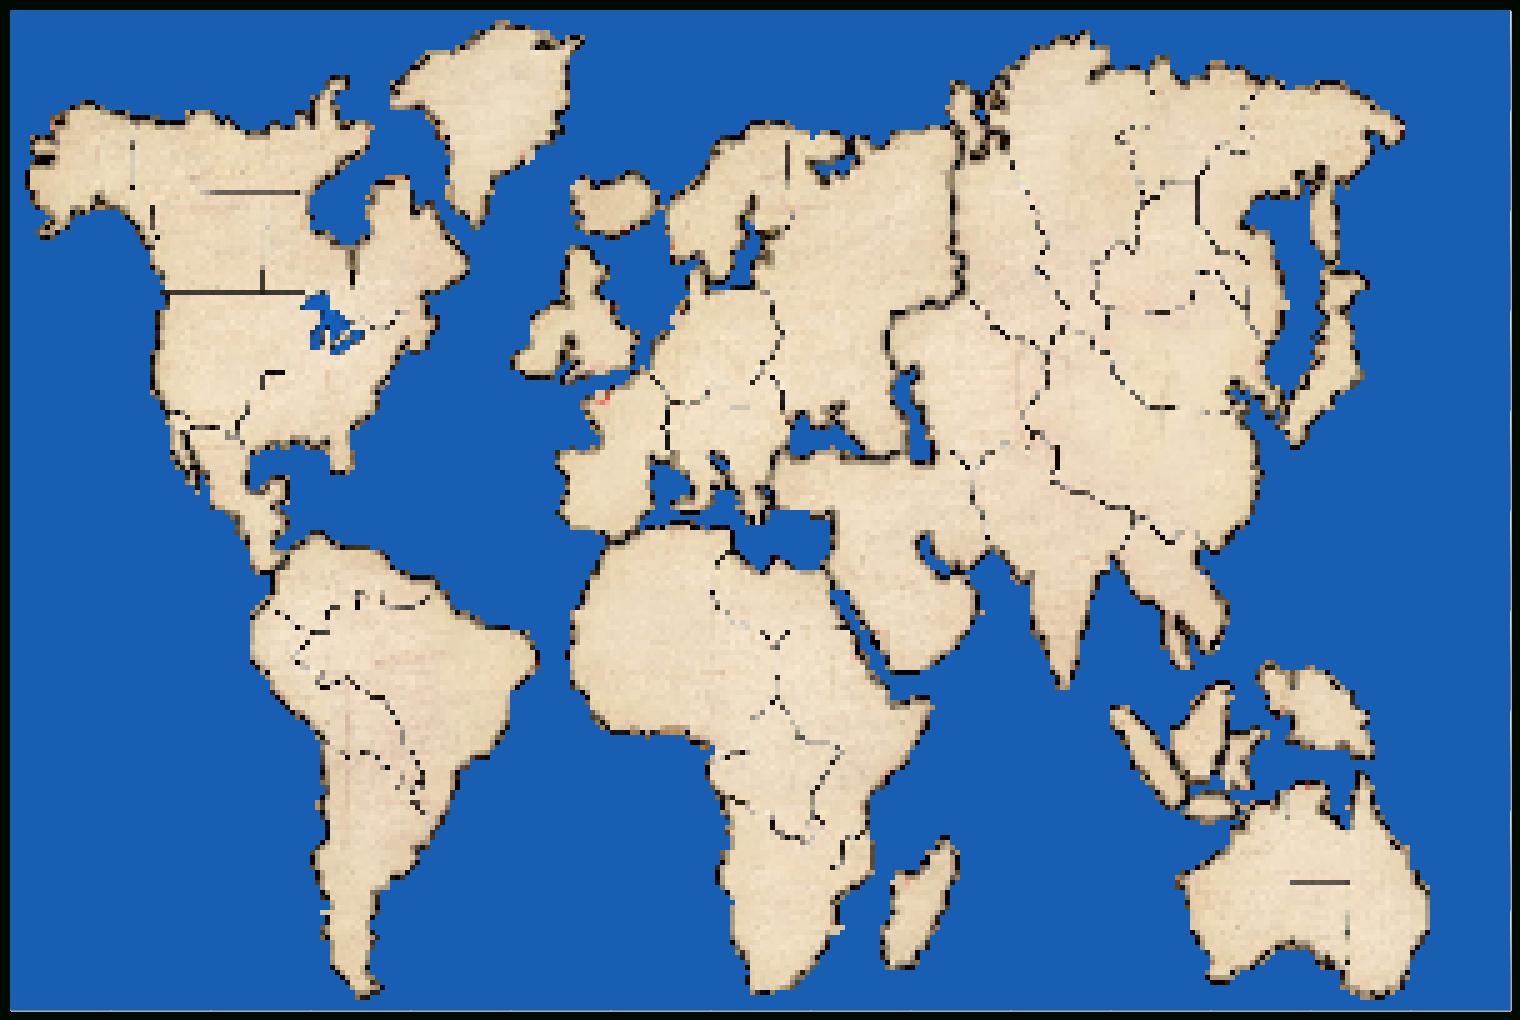 Printable Risk Board Game Map - Risk Board Game Printable Map